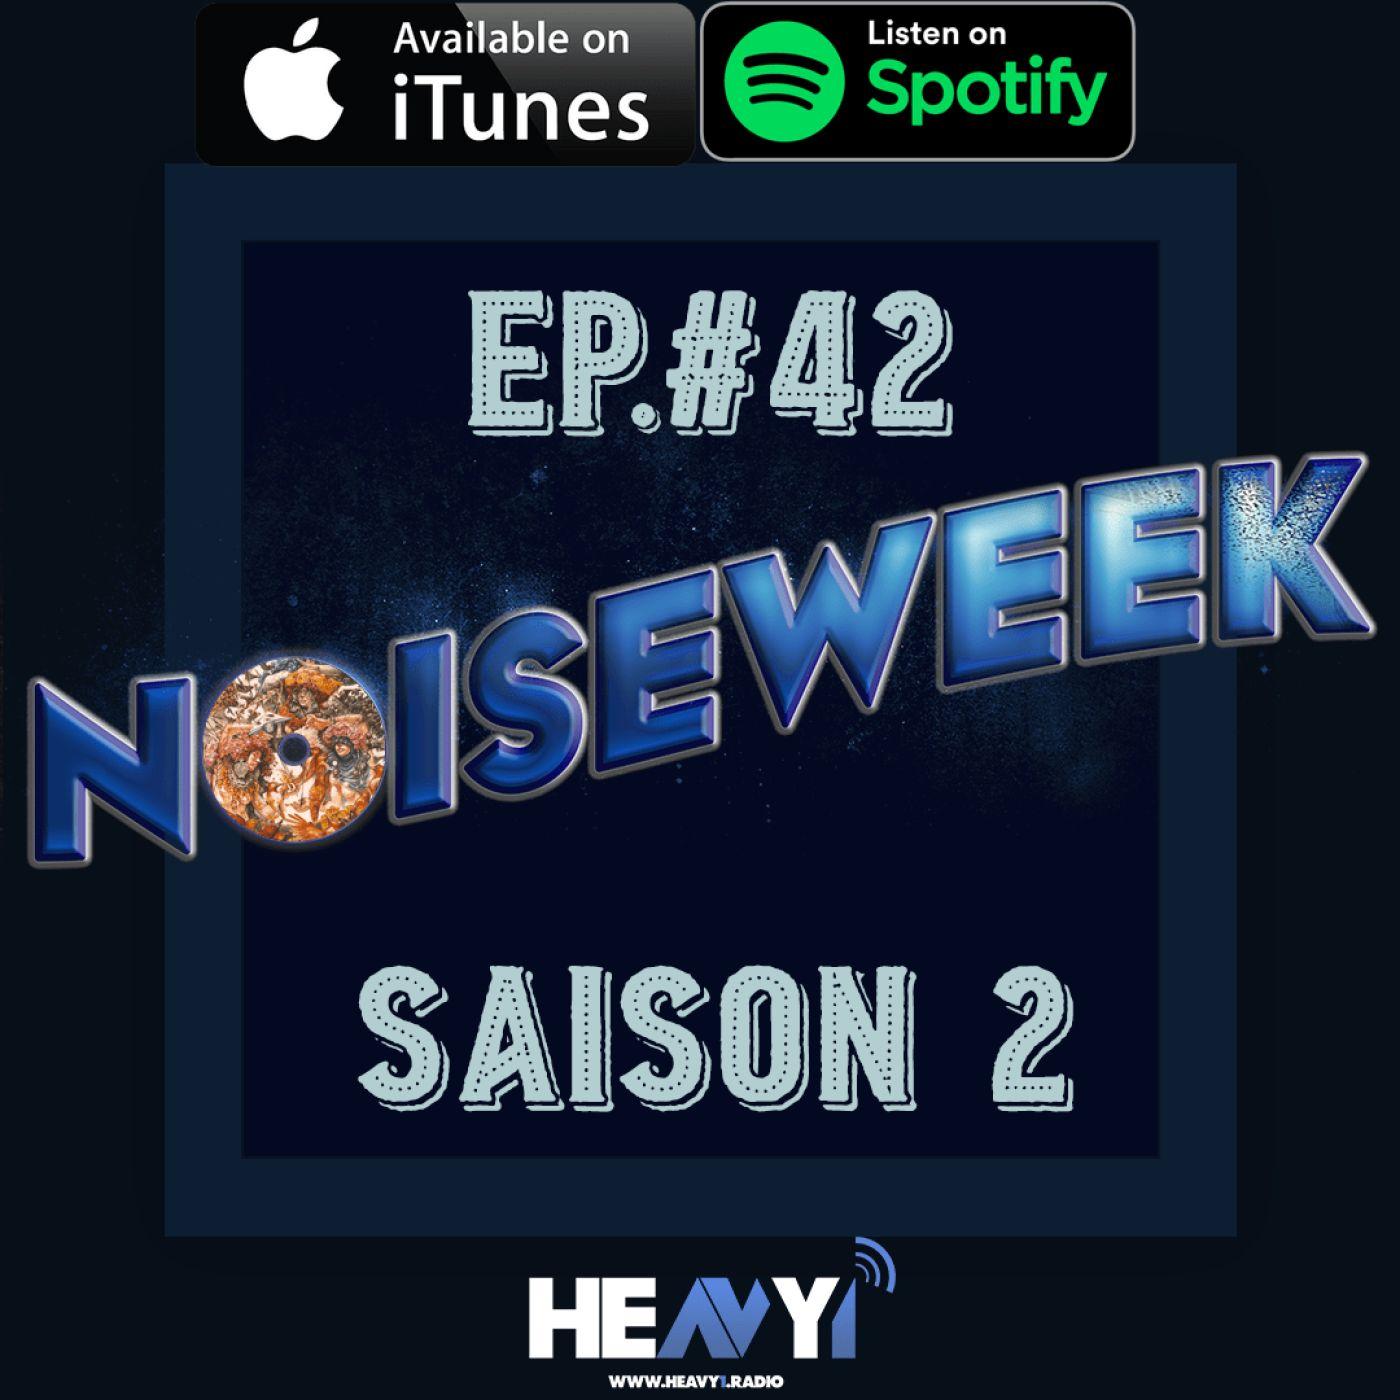 Noiseweek #42 Saison 2